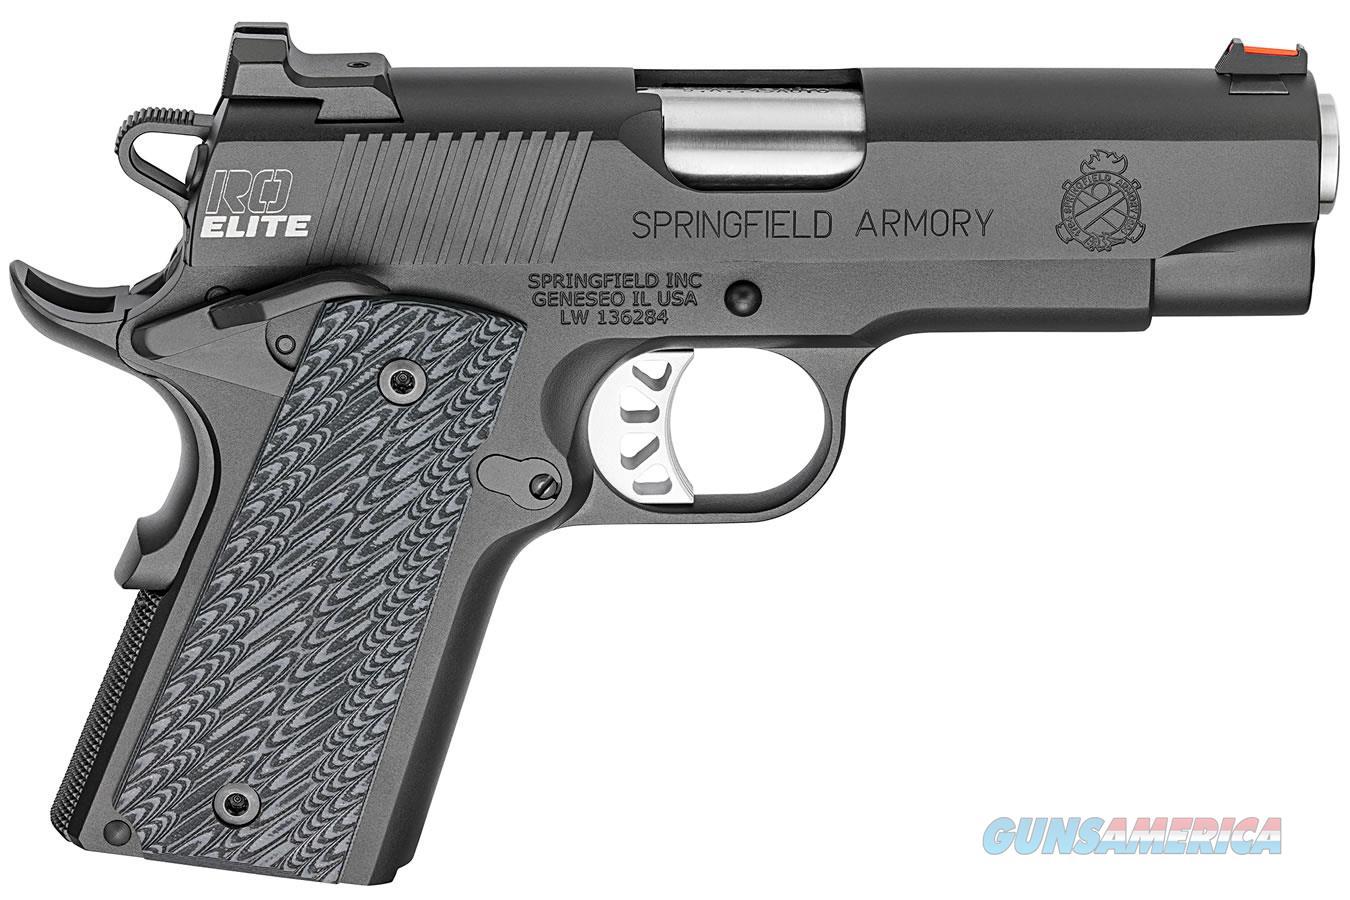 "Springfield 1911 Range Officer Elite Compact .45 ACP 4"" PI9126E   Guns > Pistols > Springfield Armory Pistols > 1911 Type"